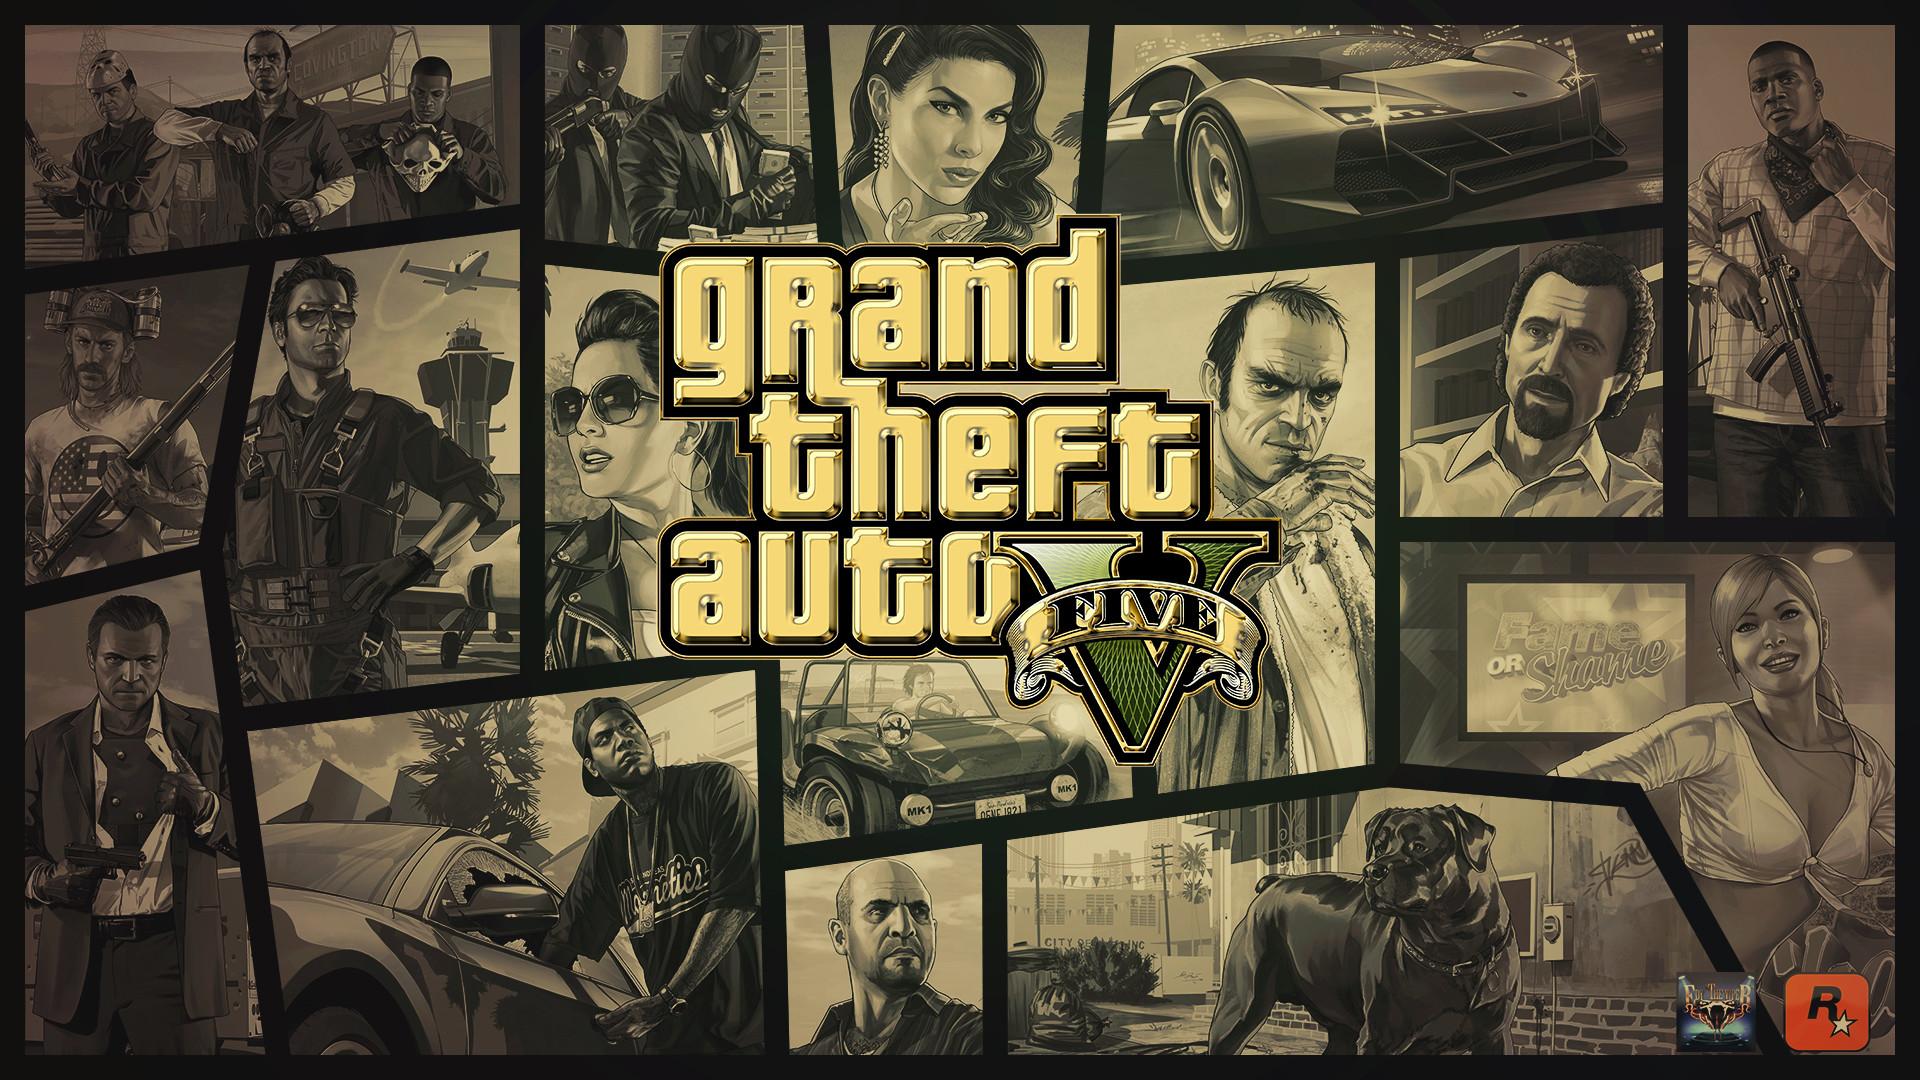 … Grand Theft Auto V Gold Logo Wallpaper by eduard2009